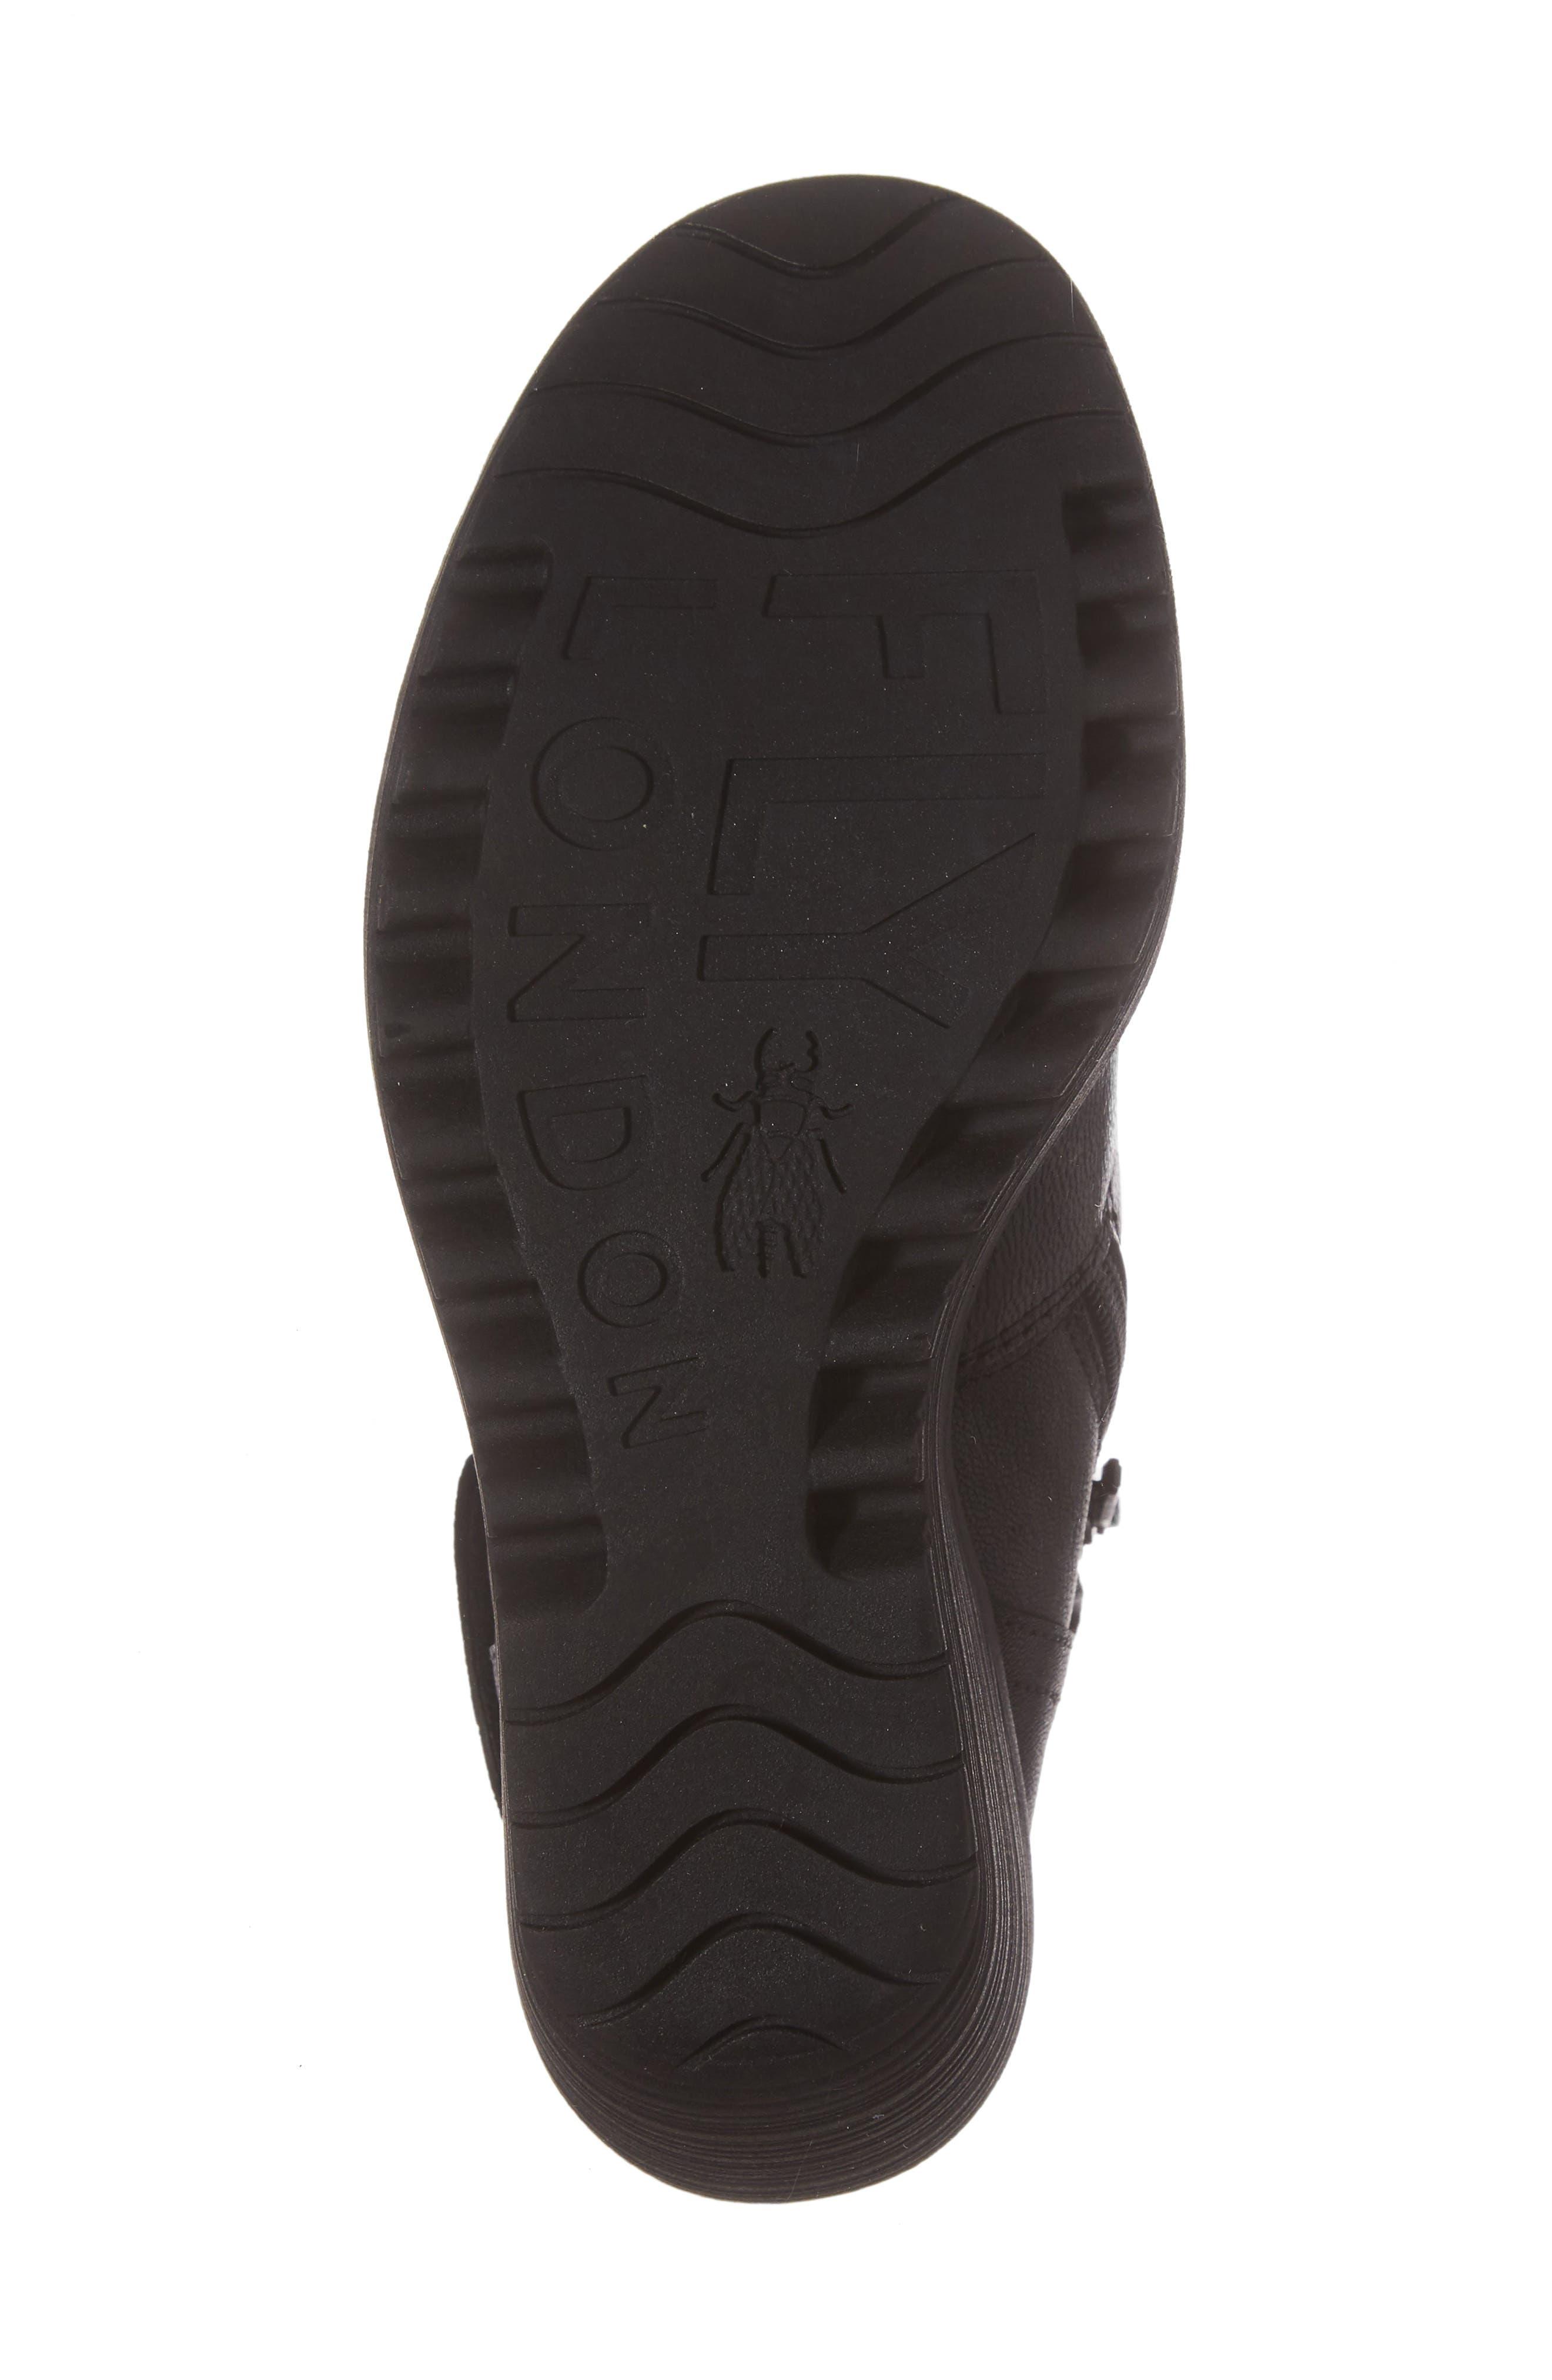 Yock Waterproof Gore-Tex<sup>®</sup> Wedge Boot,                             Alternate thumbnail 6, color,                             001